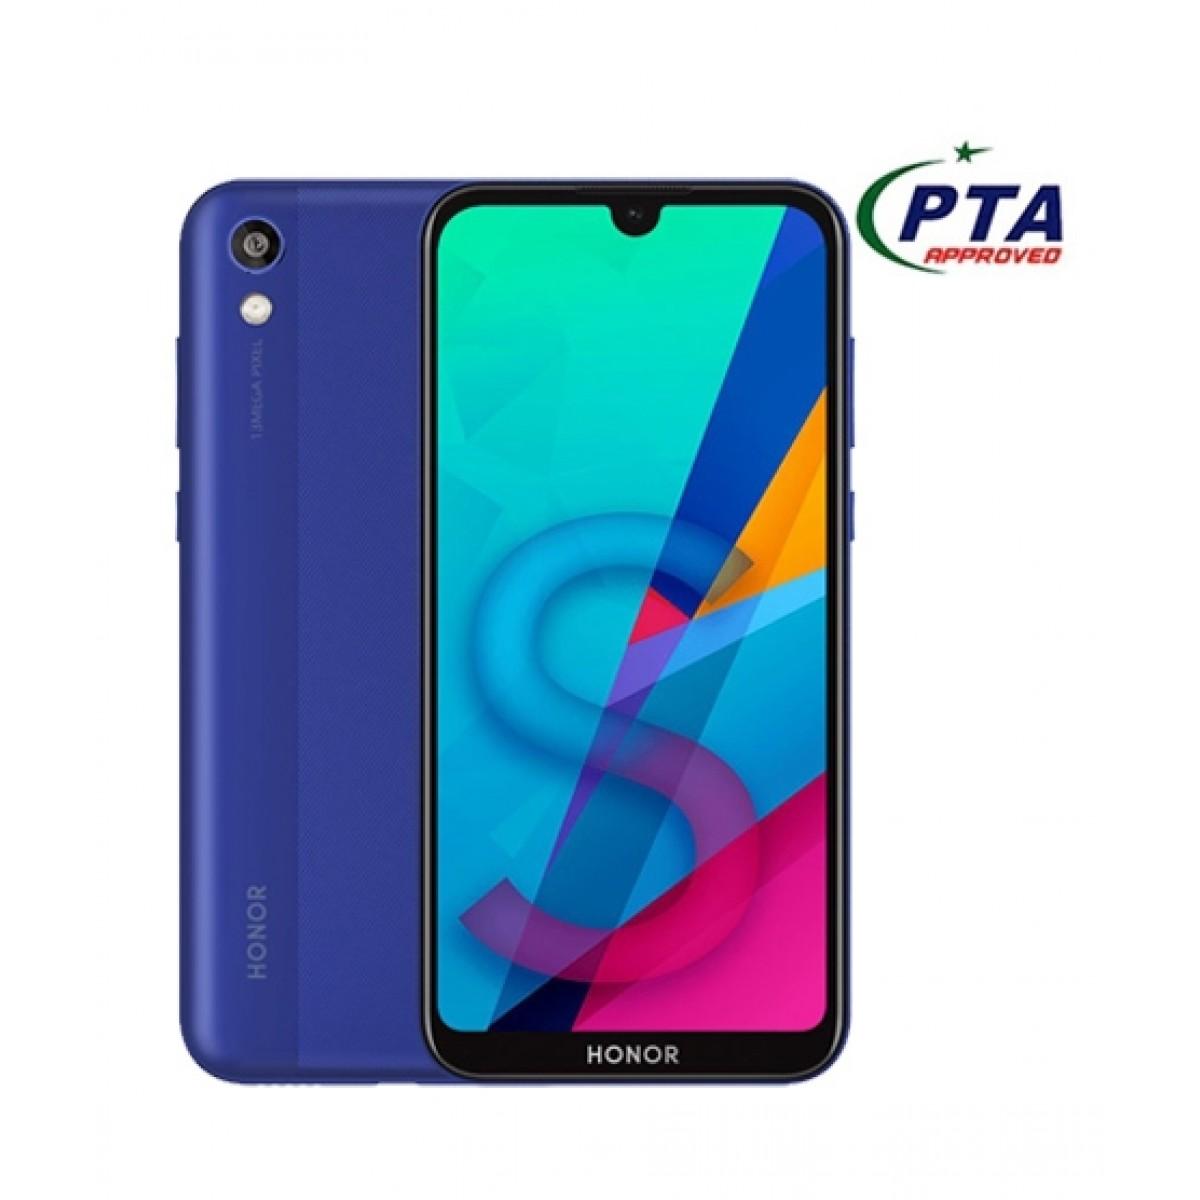 Honor 8S 32GB Dual Sim Blue - Official Warranty